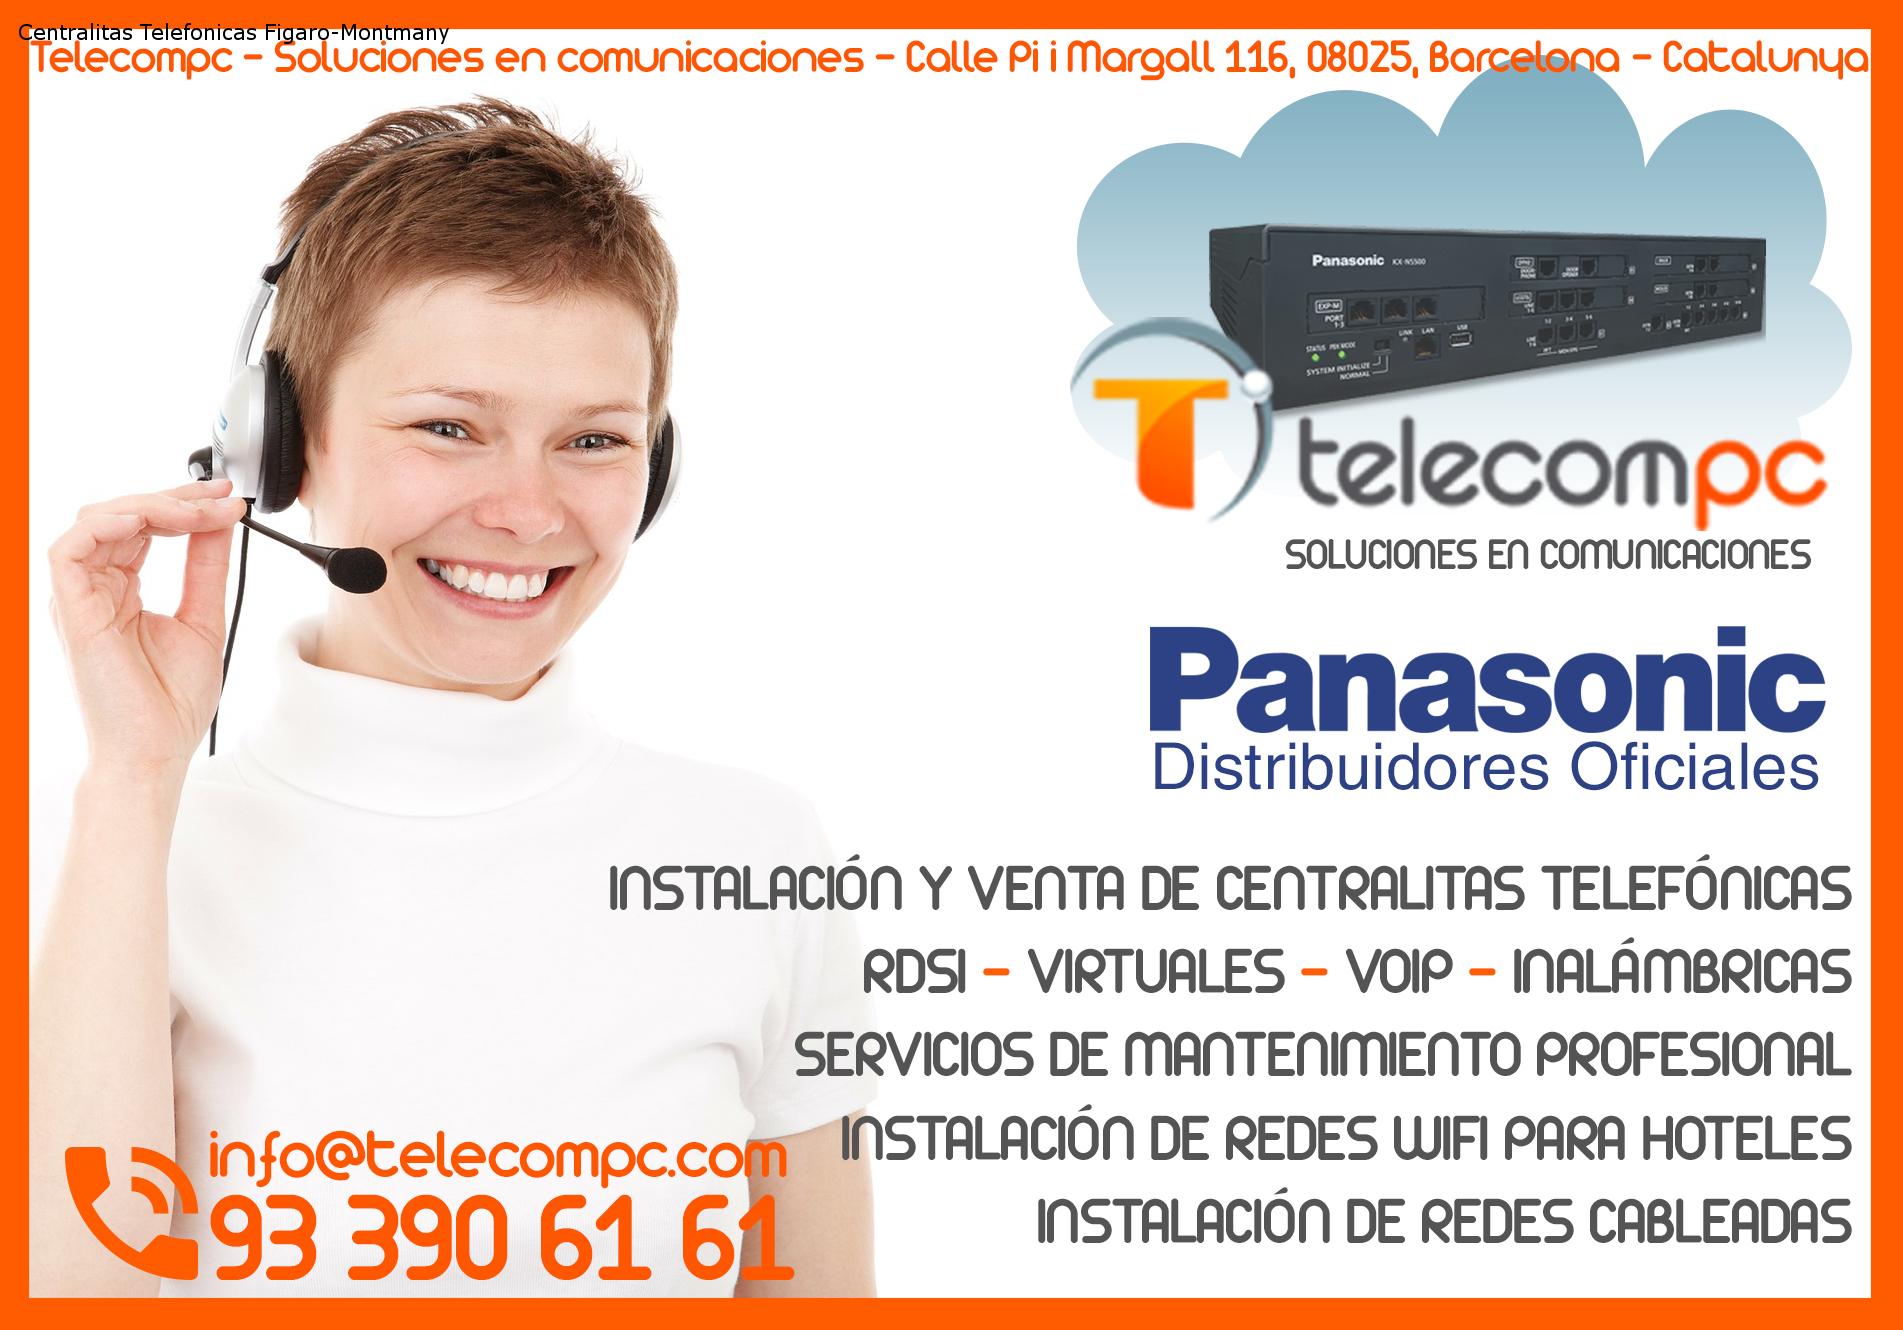 Centralitas Telefonicas Figaro-Montmany